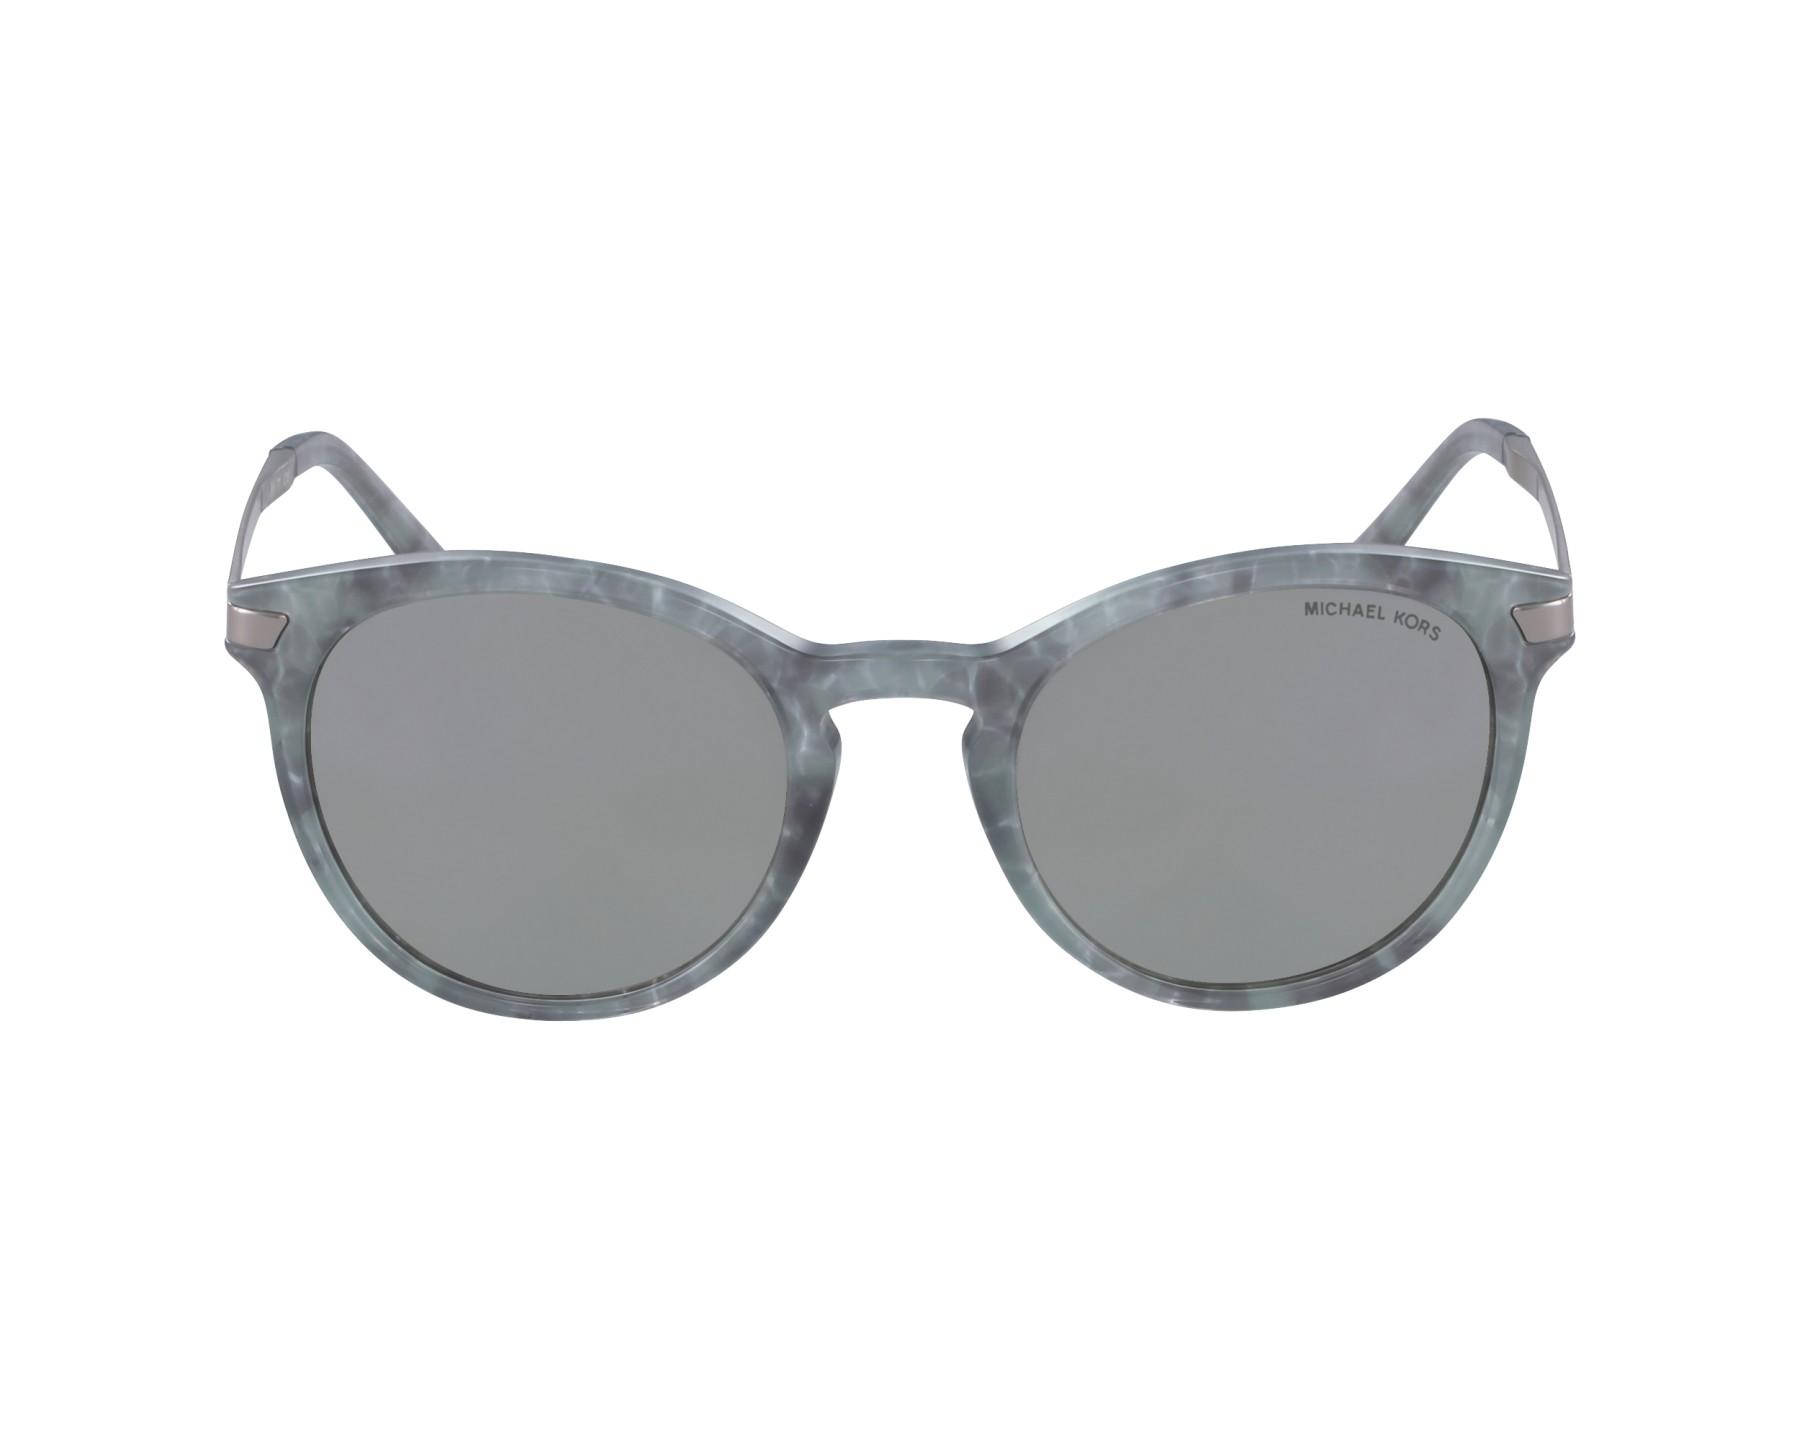 Michael Kors Adrianna Sunglasses  michael kors sunglasses adrianna iii mk2023 3161 6g 53 visionet